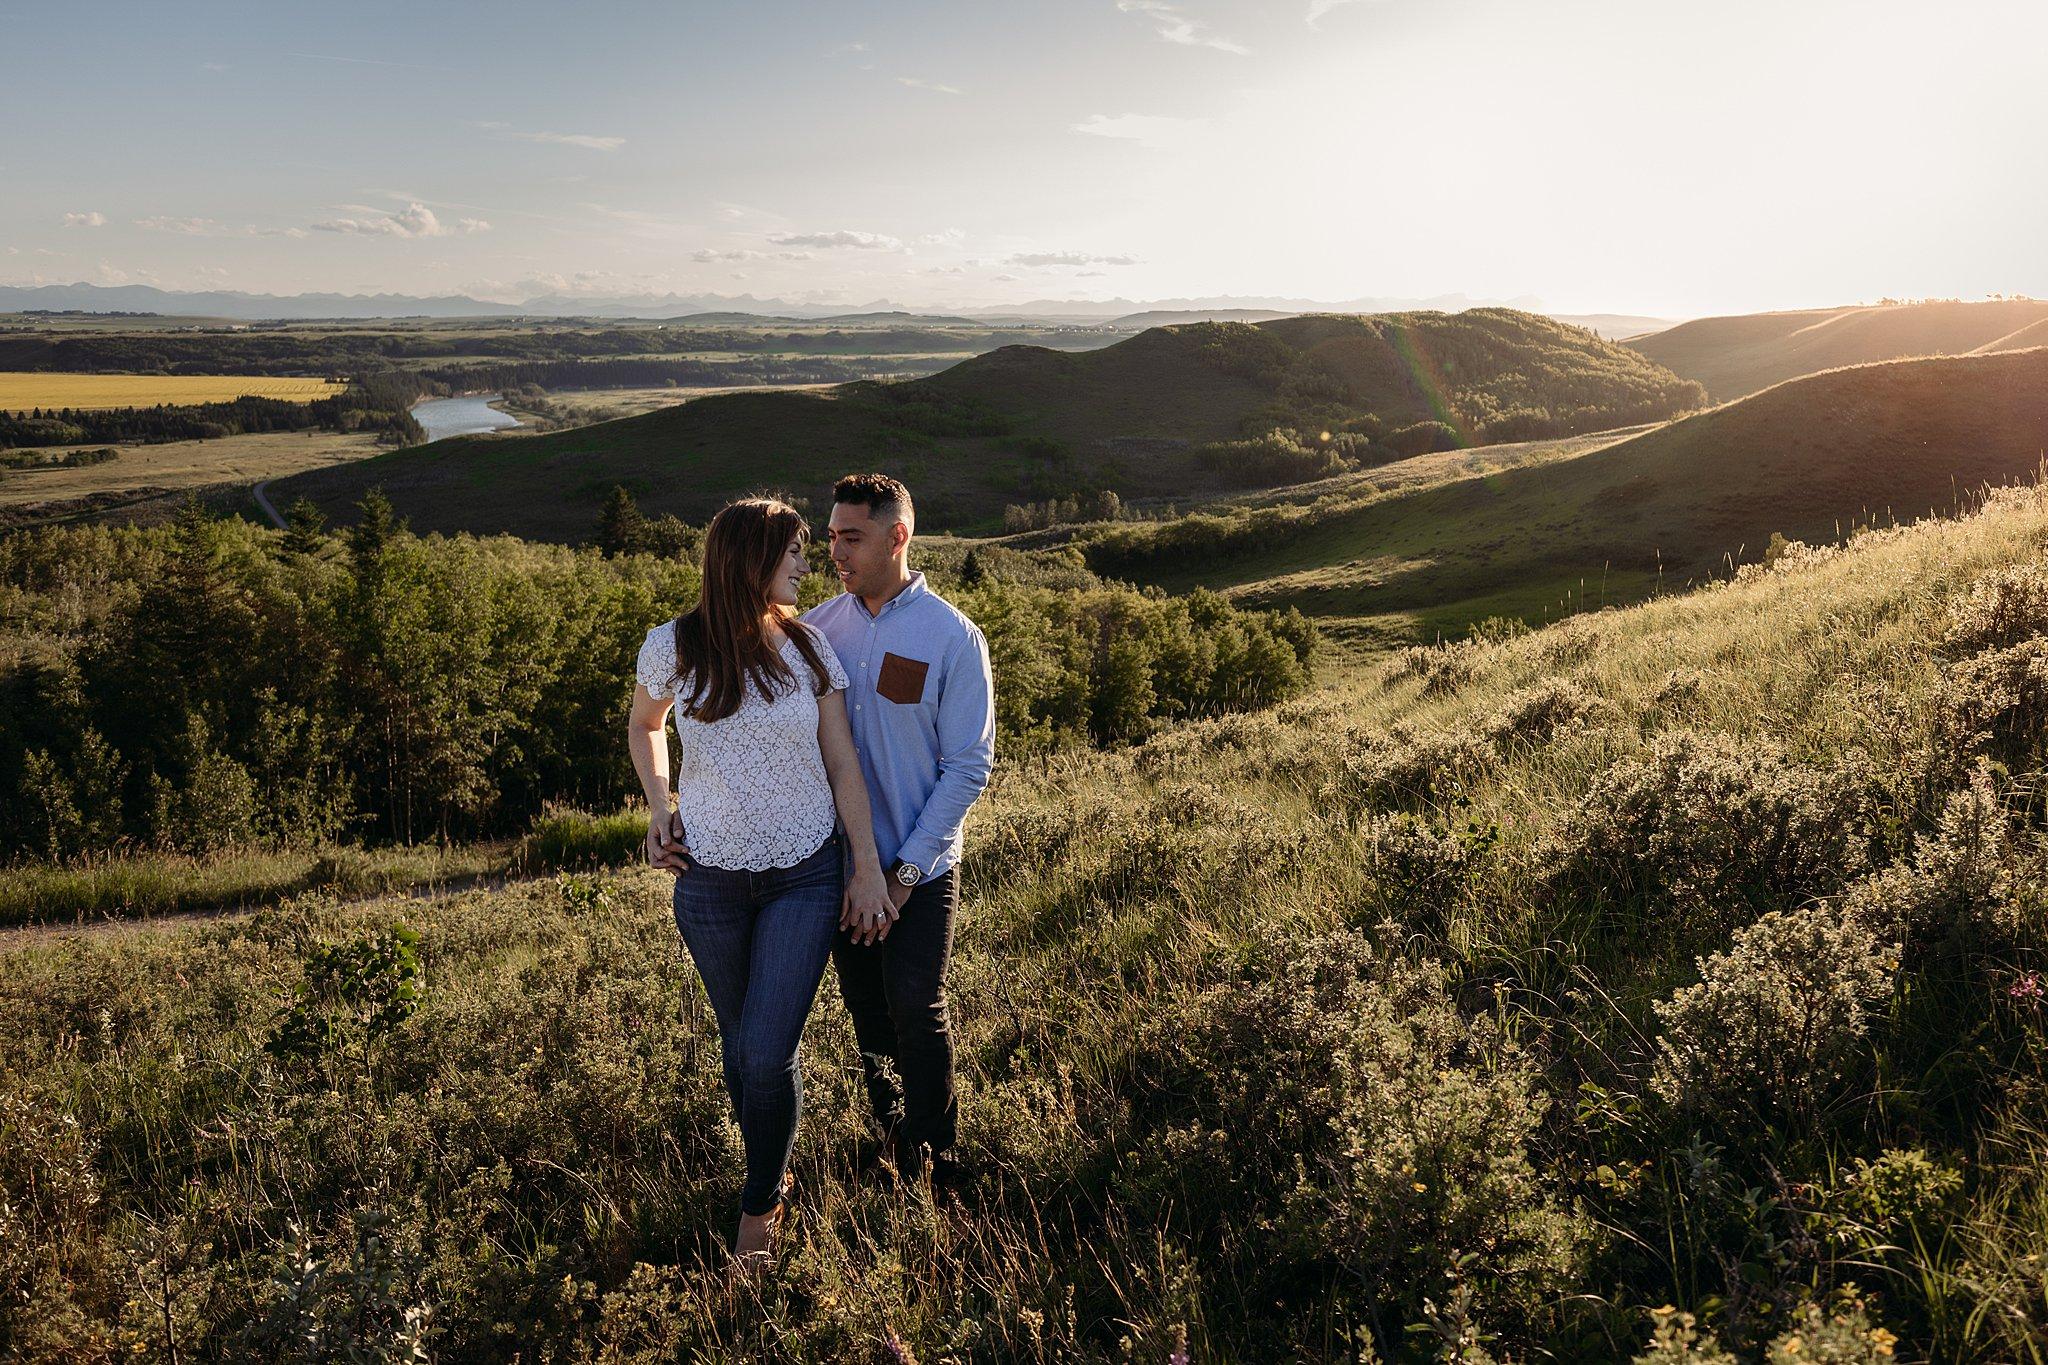 Ashley Daphne Photography,Calgary wedding photographer,Engagement photographer,Glenbow Ranch Provincial Park,alberta,engagement photos,golden hour,yyc wedding photographer,